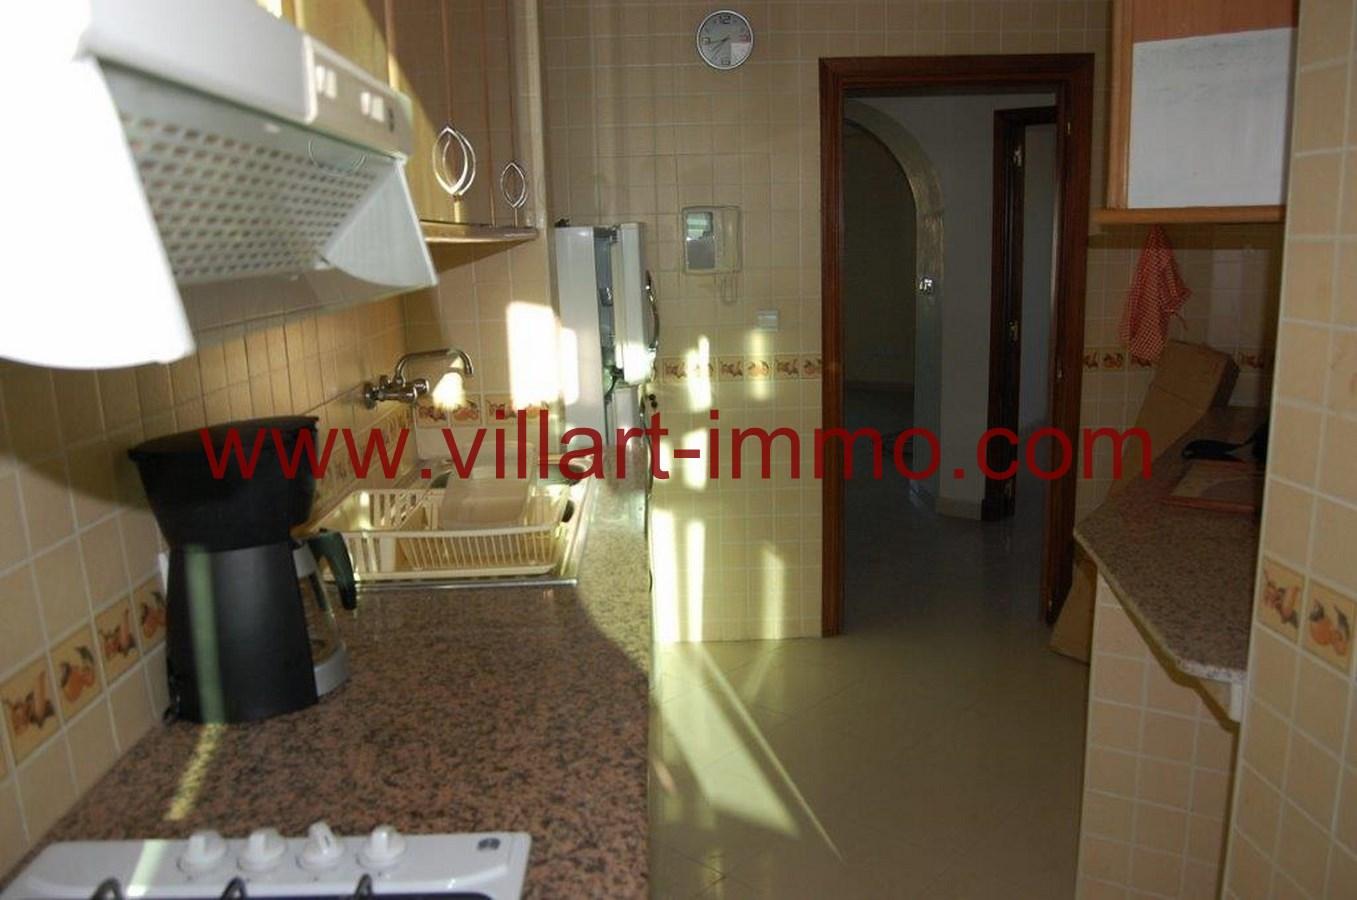 7-Location-Appartement-Non meublé-Tanger-Cuisine-L718-Villart immo